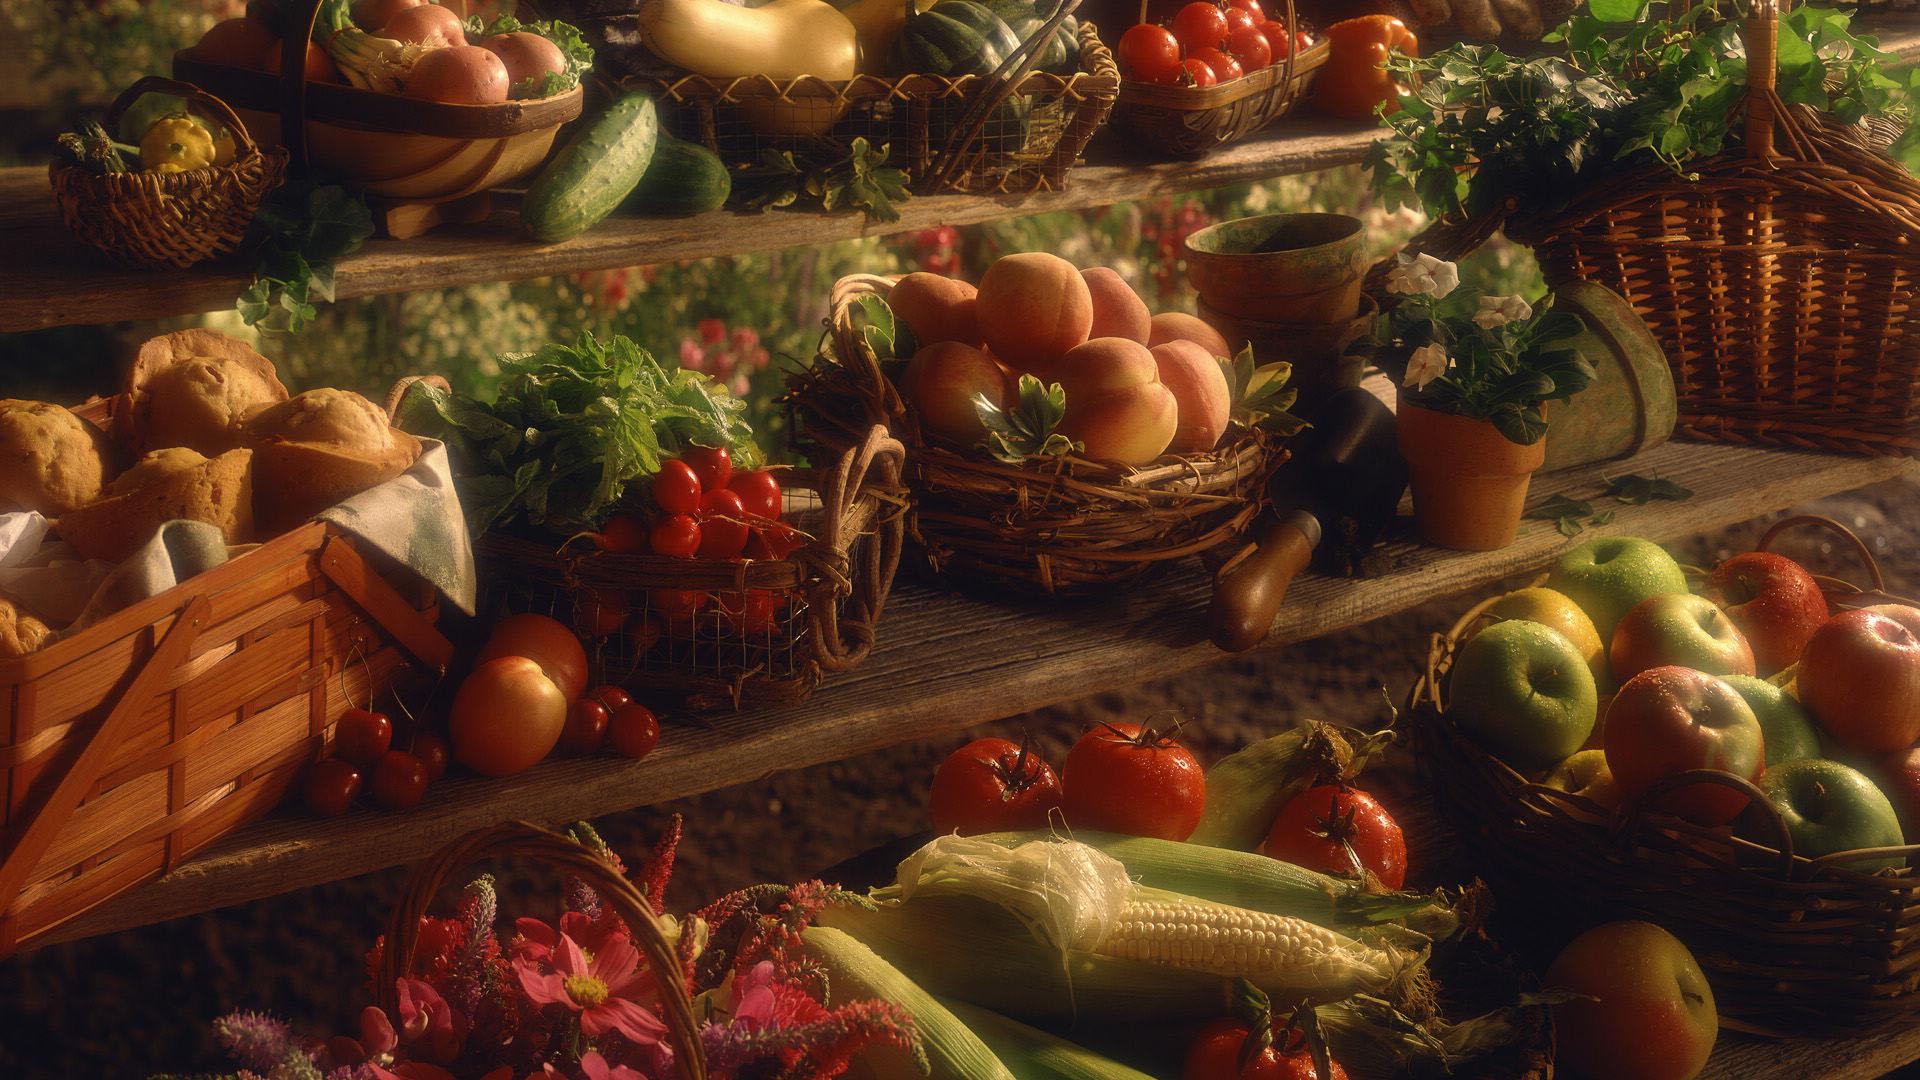 Thanksgiving Wallpaper Desktop 1080 - HD Wallpaper